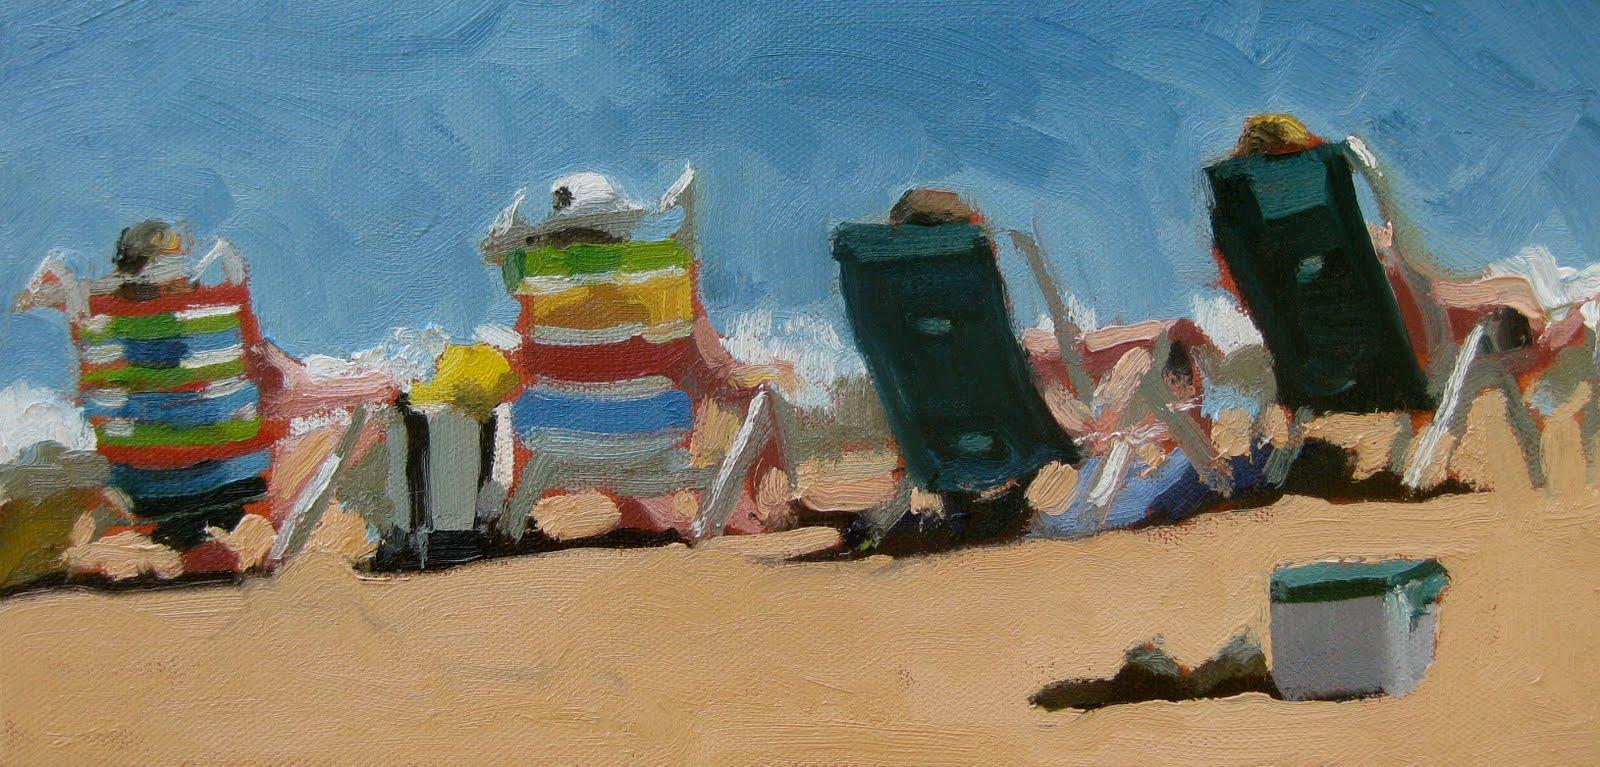 Beach chairs on the beach painting - Beach Chairs